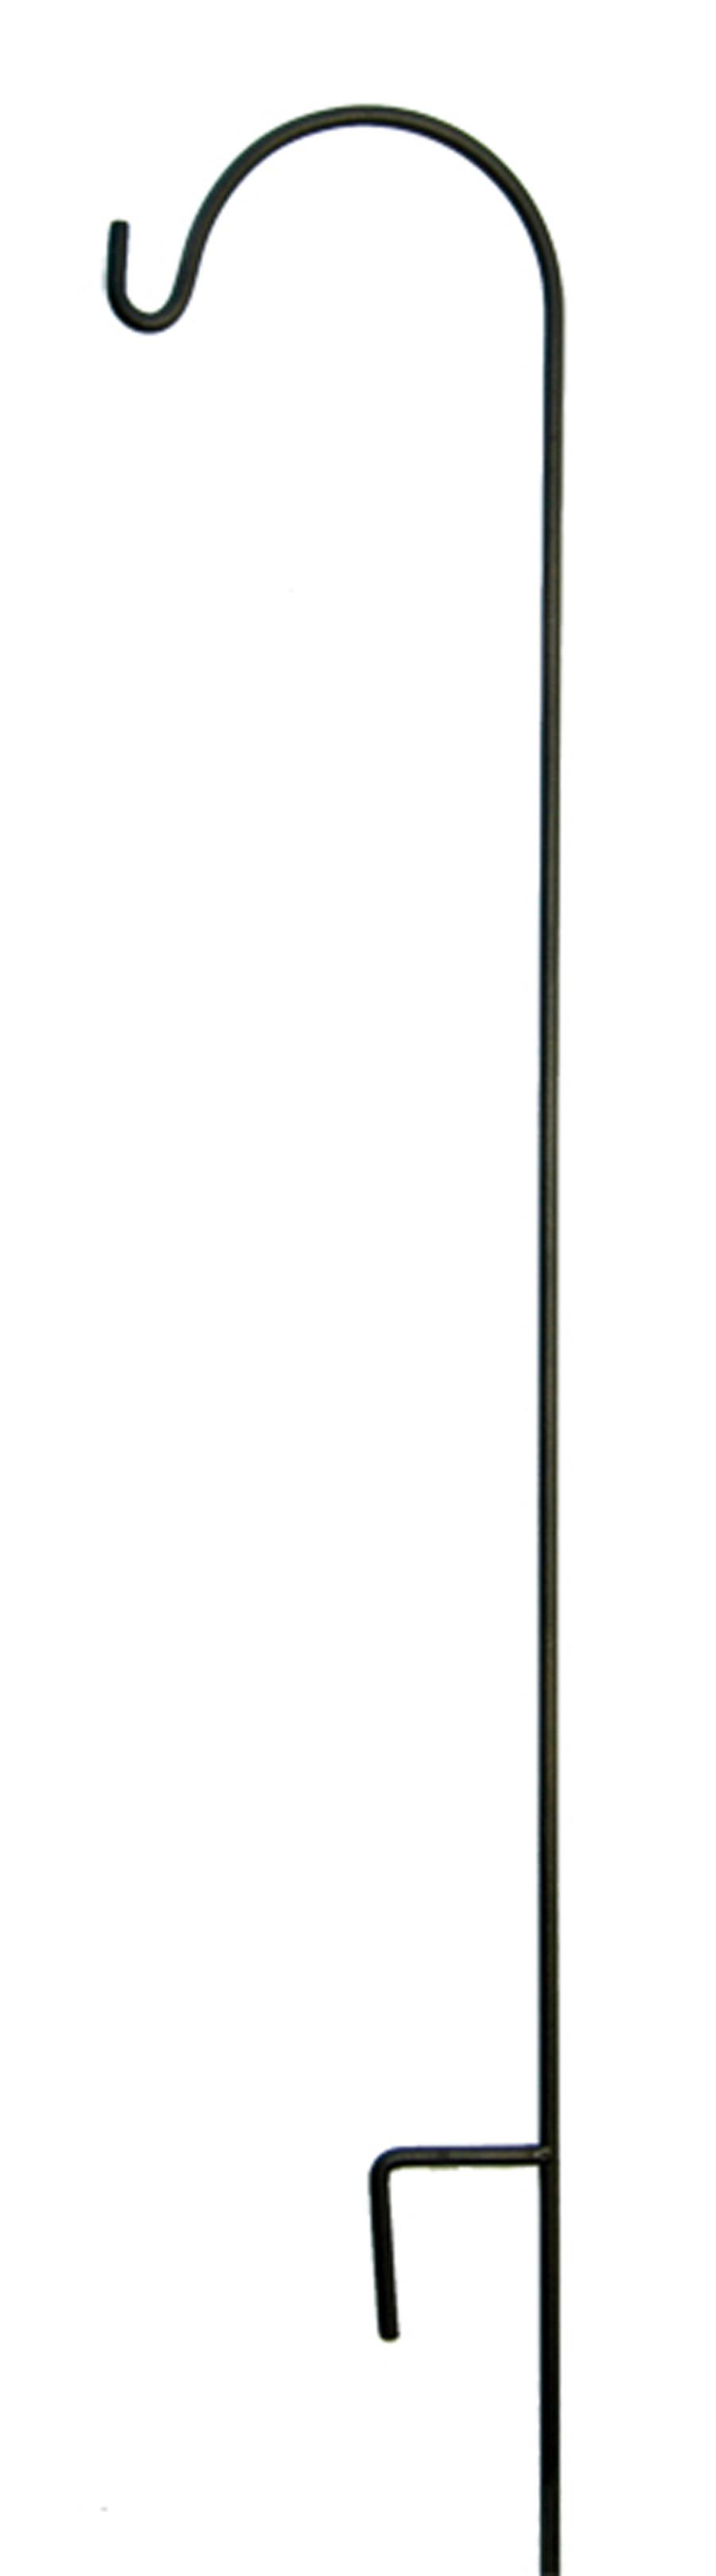 American GardenWorks Tall Hangers Single Black 10ea/90Inx12 in